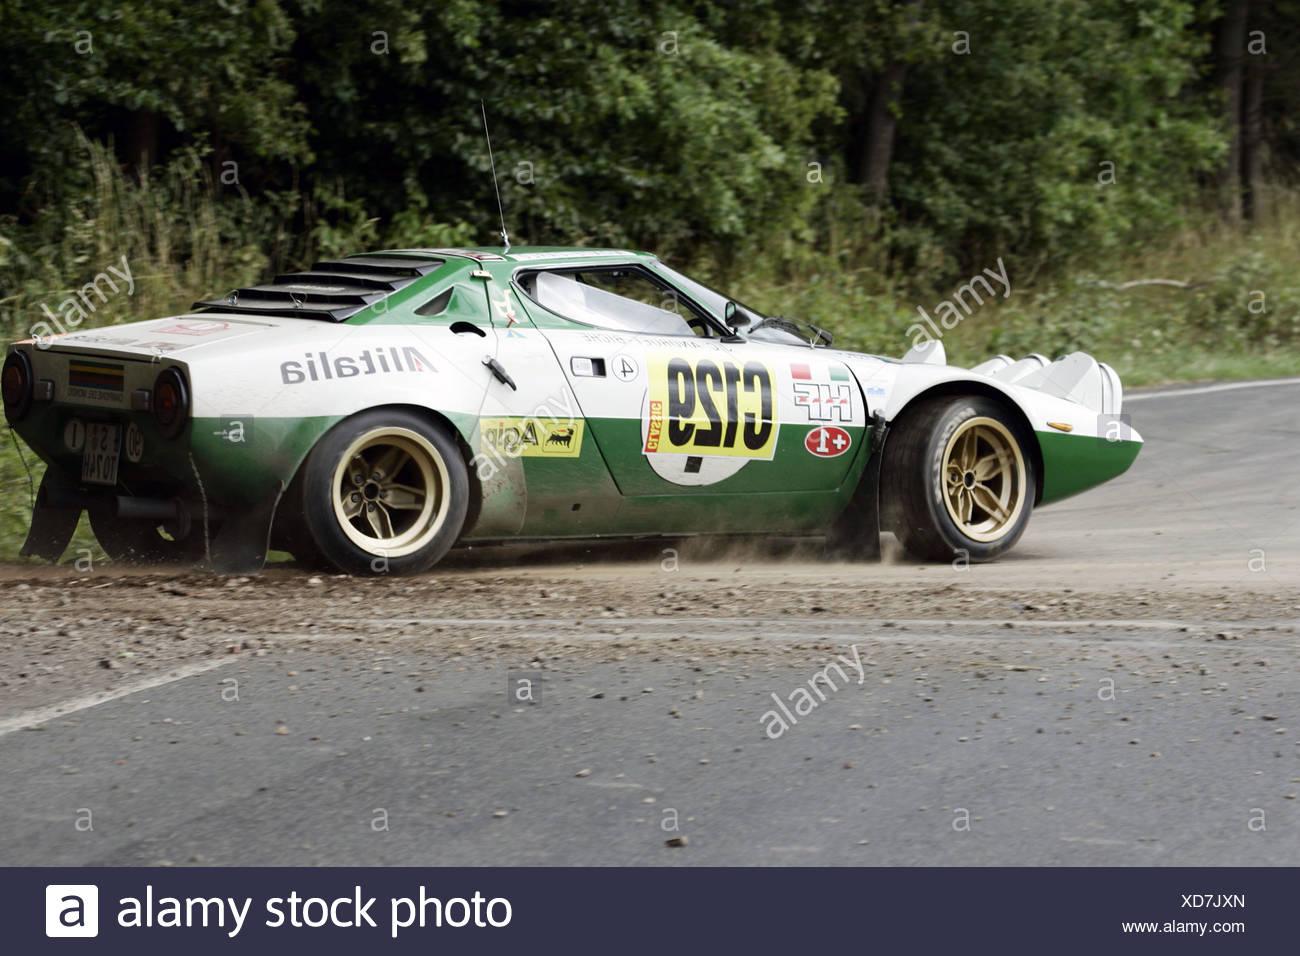 WRC Rallye WM Germany, vintage car, Lancia Stratos - Stock Image